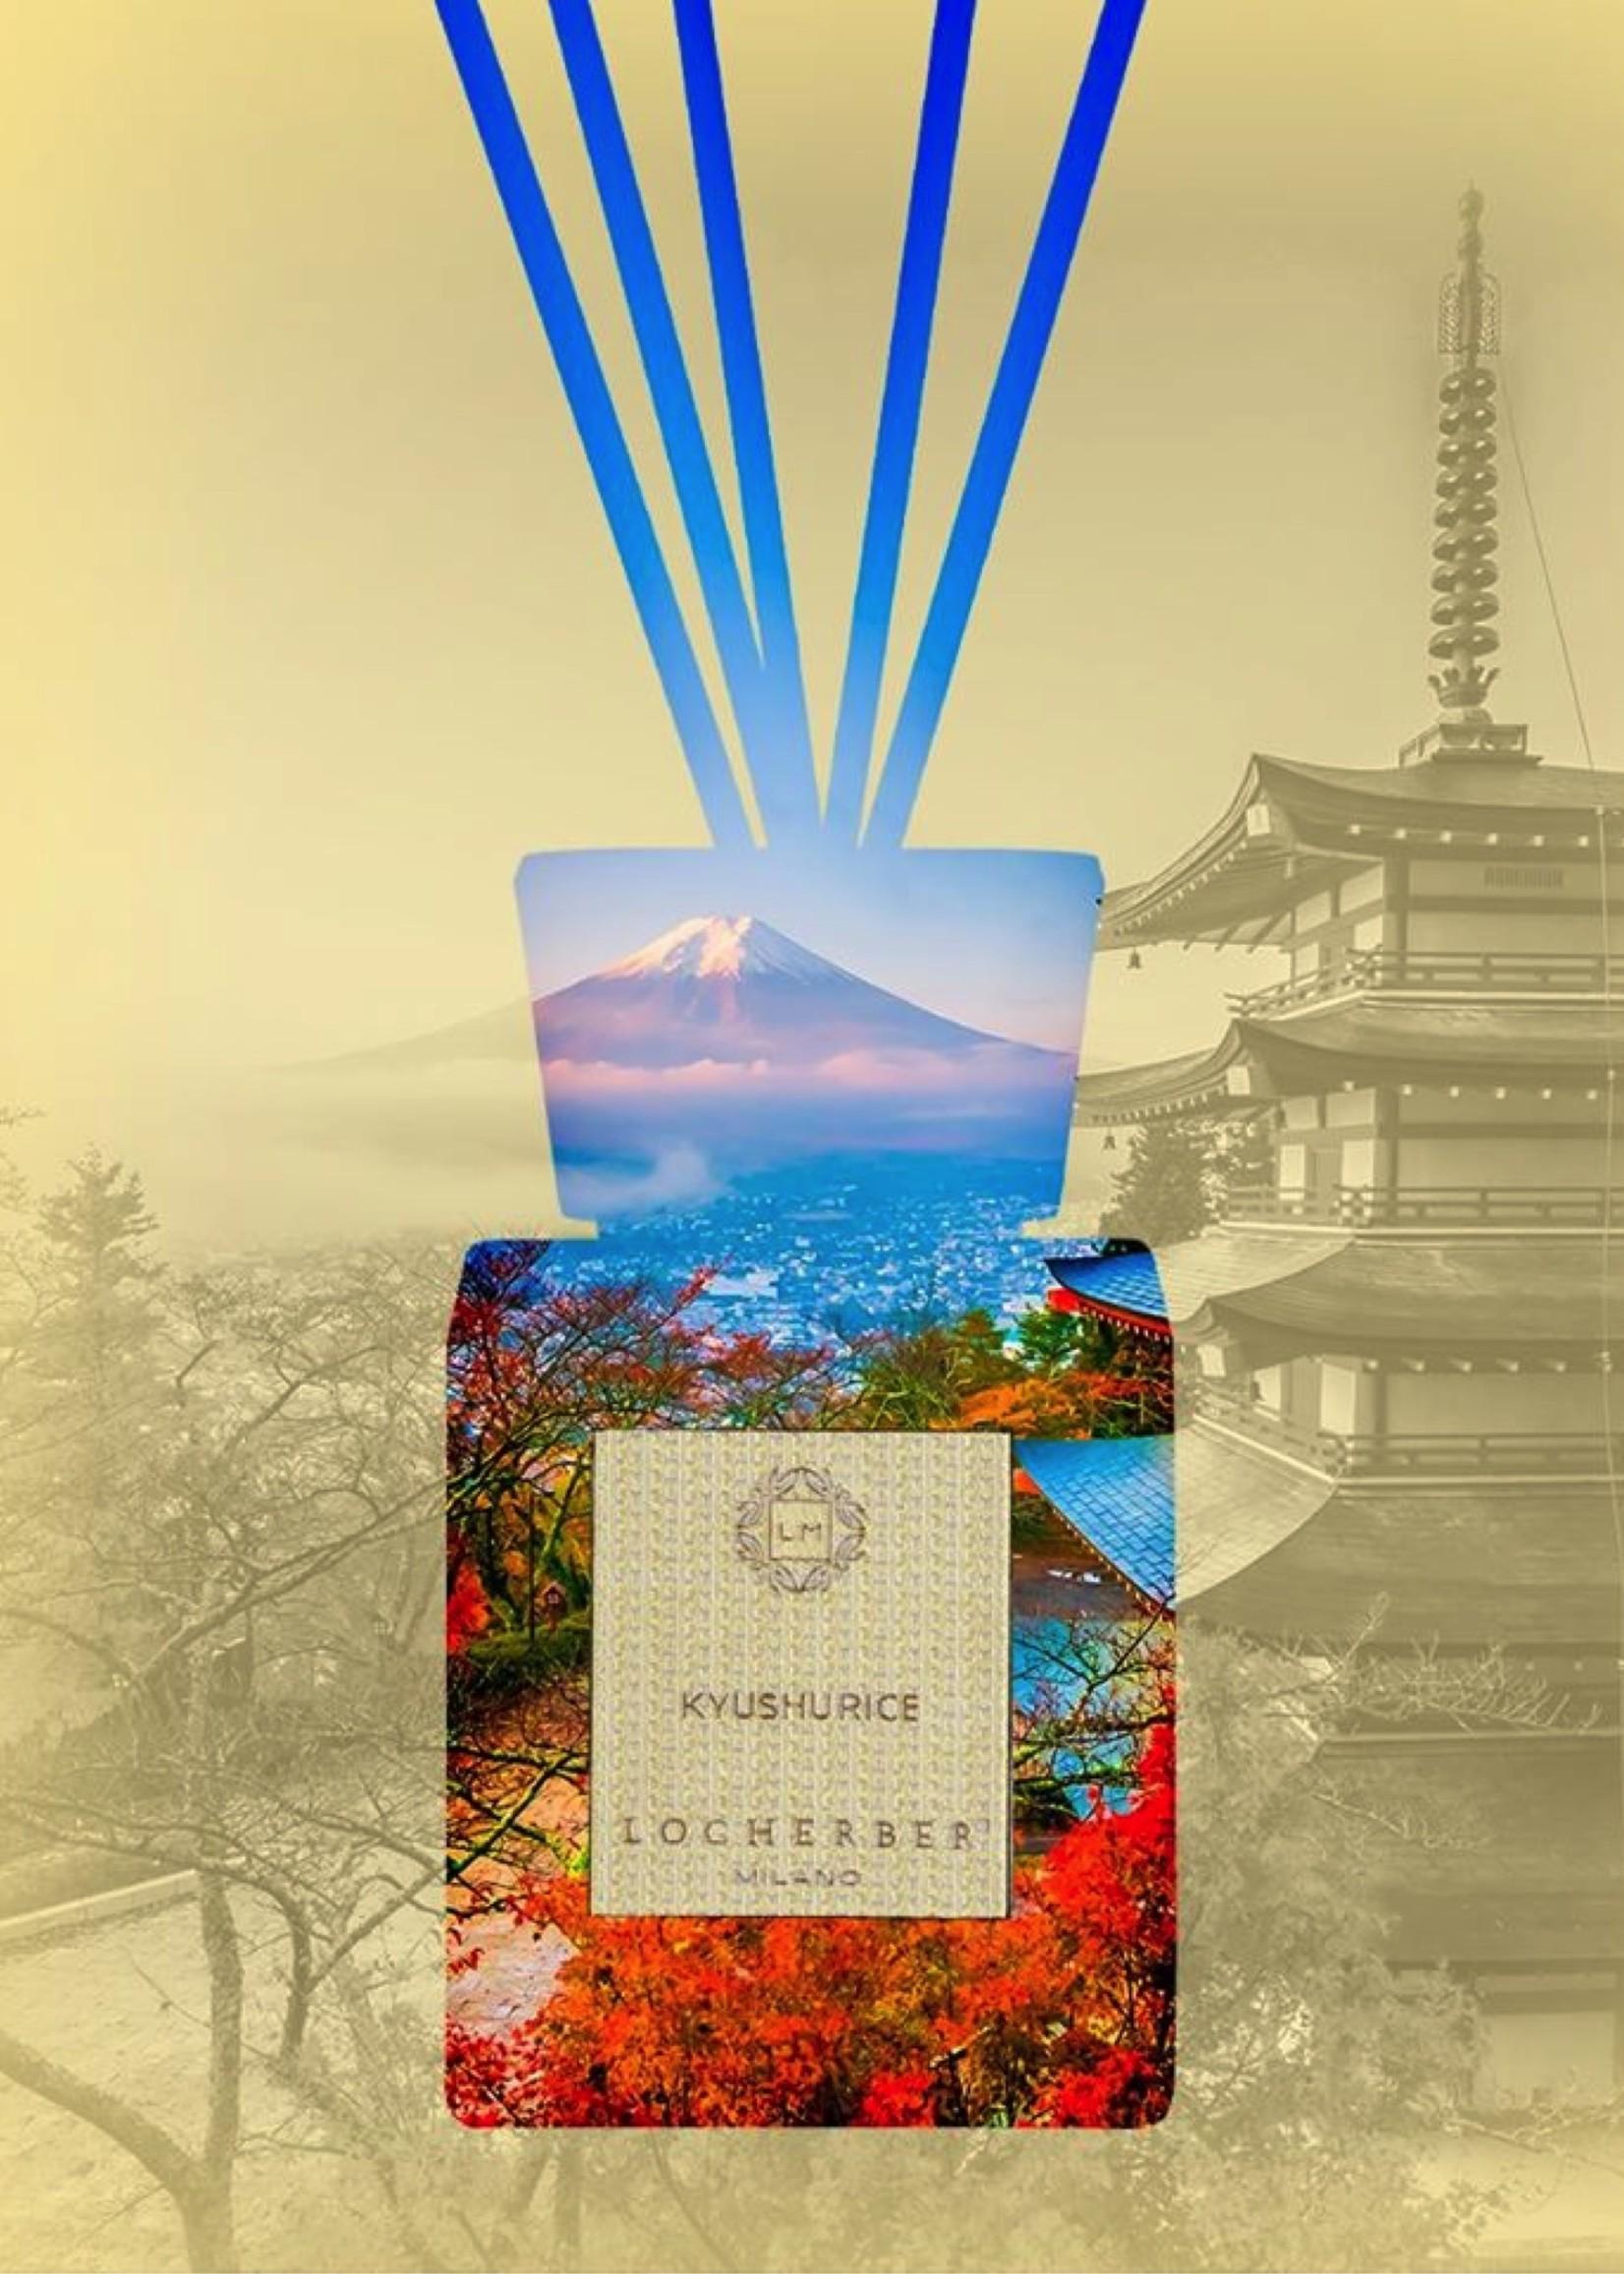 Locherber Locherber Milano - Kyushu Rice - Reed Diffuser